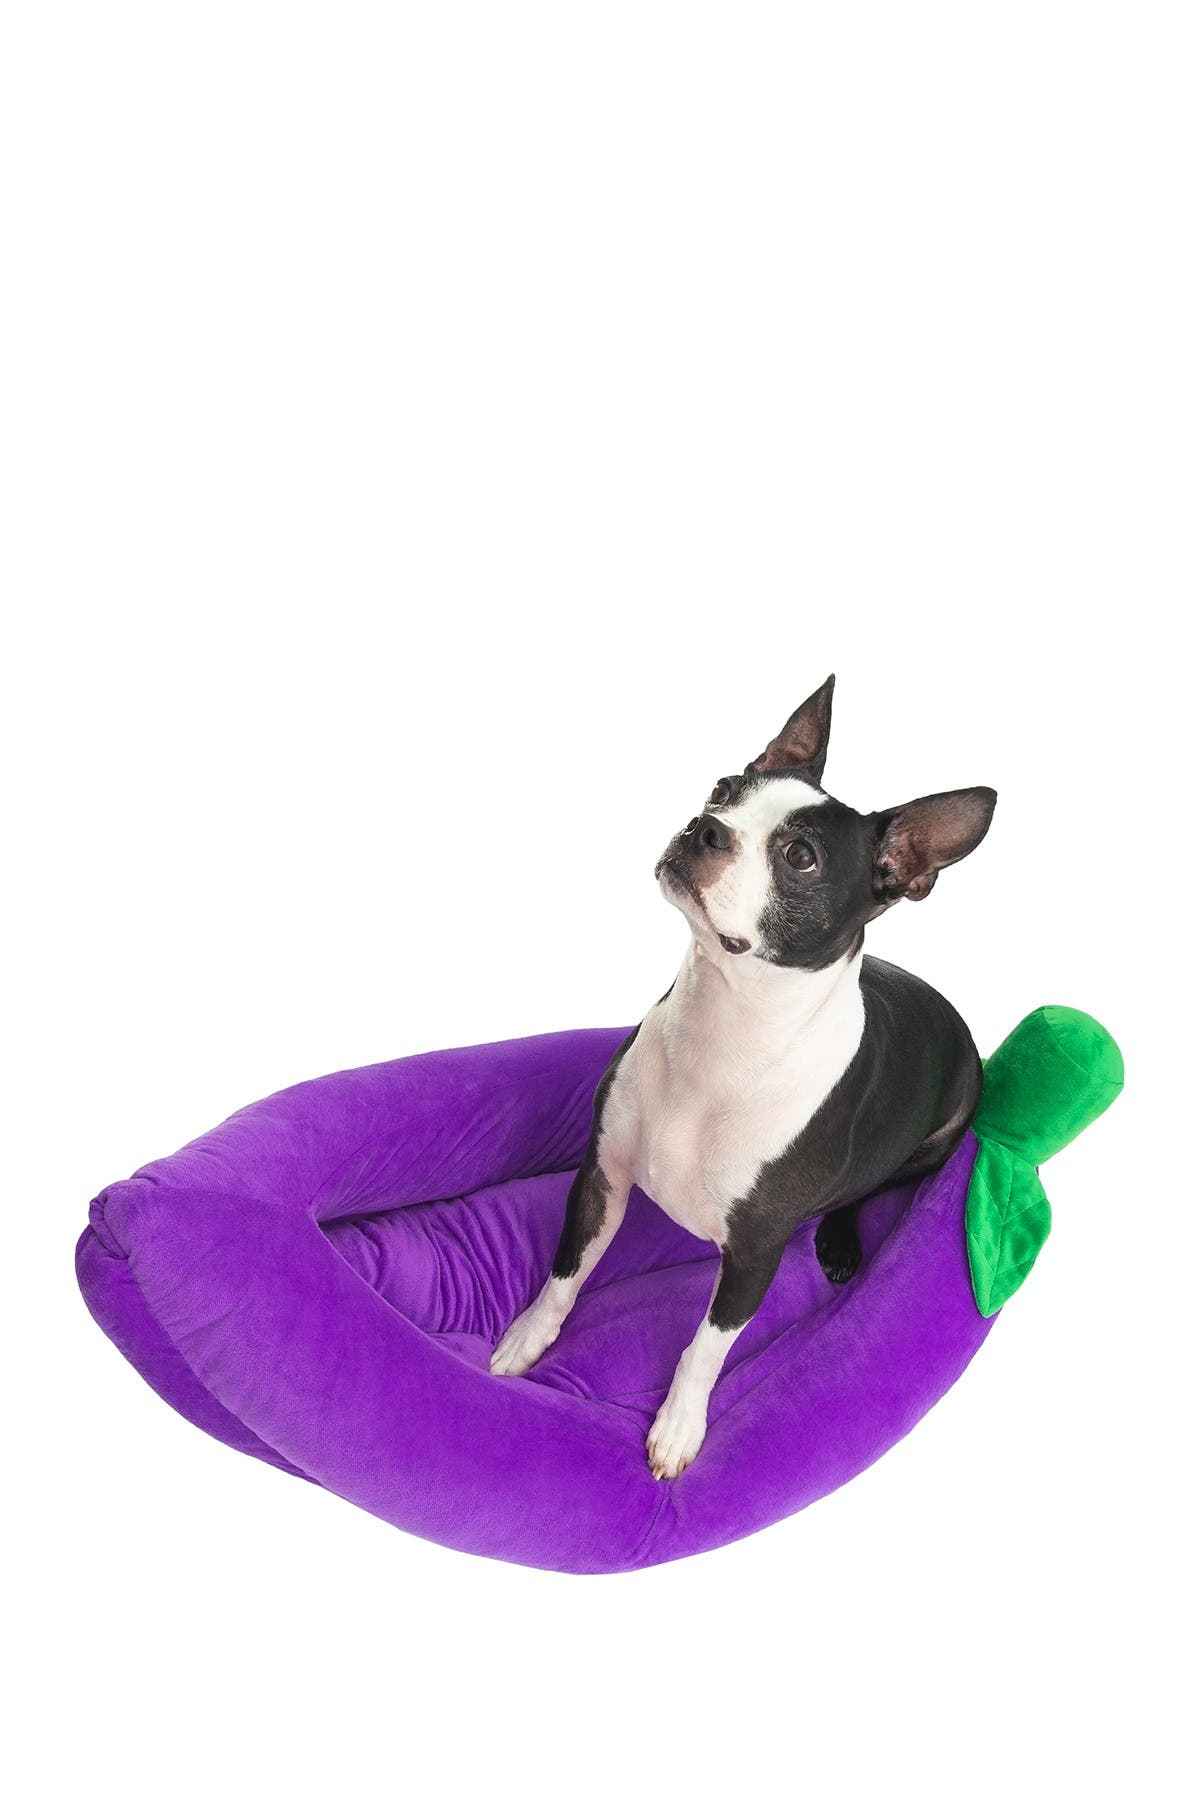 Image of Duck River Textile Benjy Fruit Pet Bed - Grape